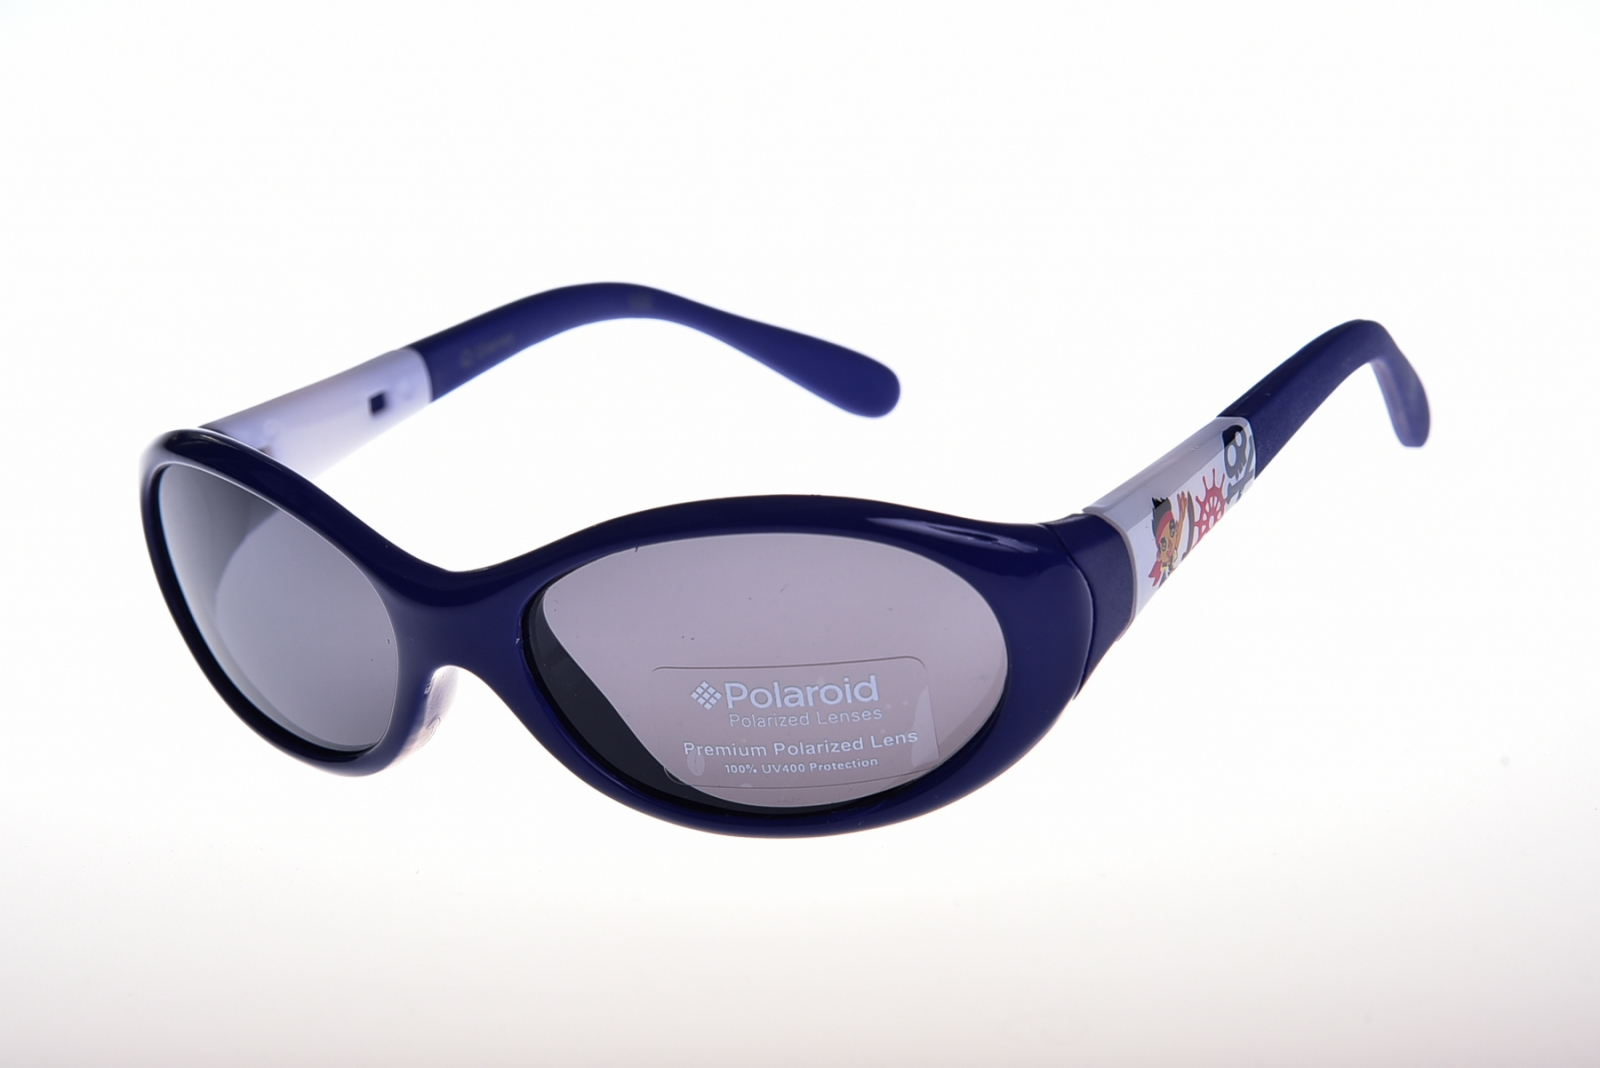 Polaroid Disney D0316C - Slnečné okuliare pre deti 1-3 r.